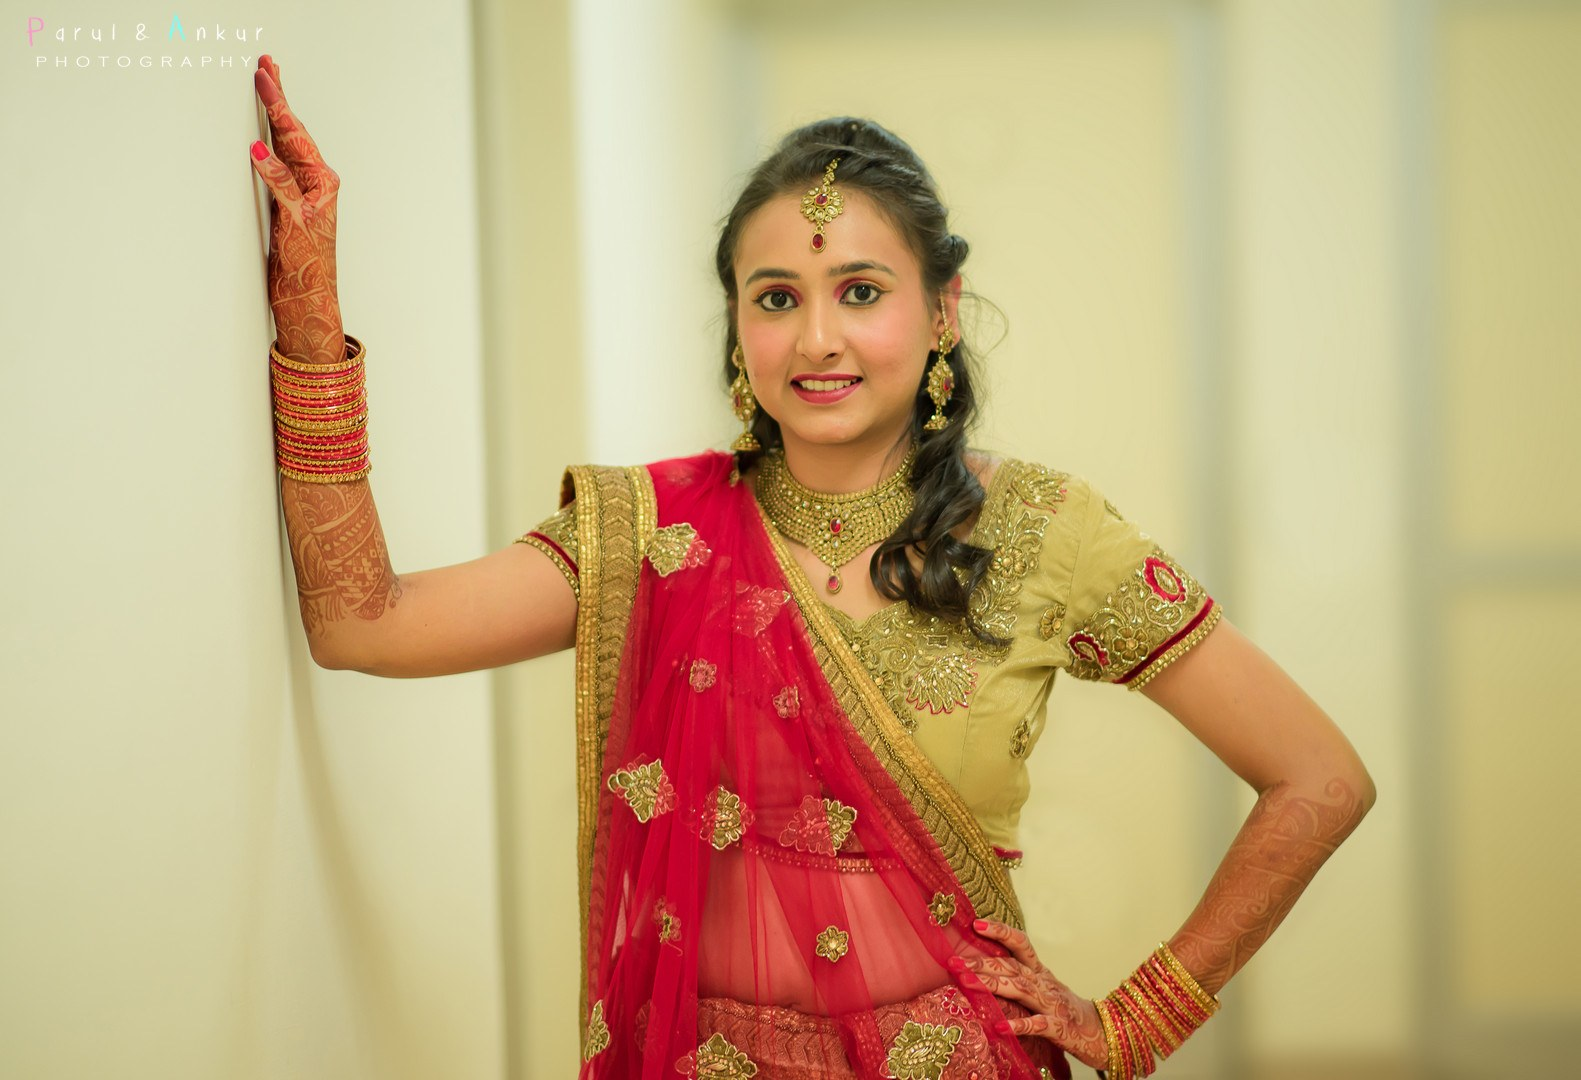 Parul And Ankur Kaushal Photography - Portfolio